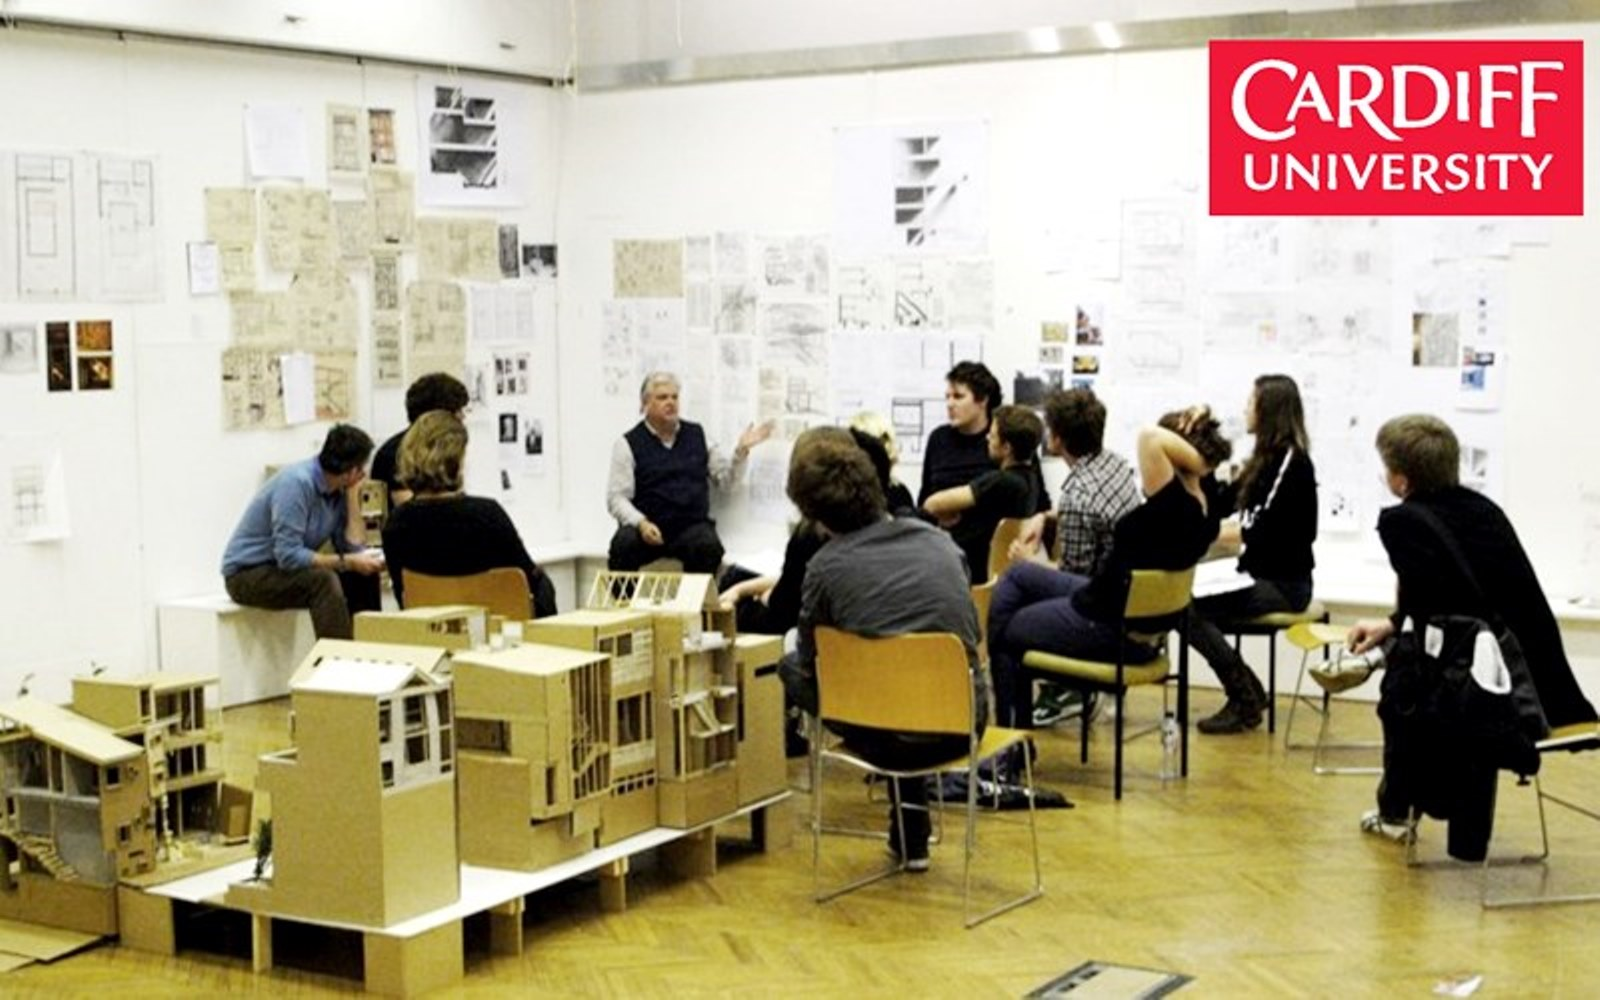 2008 - 2010 DESIGN TUTOR,  ARCHITECTURE DEGREE,  CARDIFF UNIVERSITY, WALES